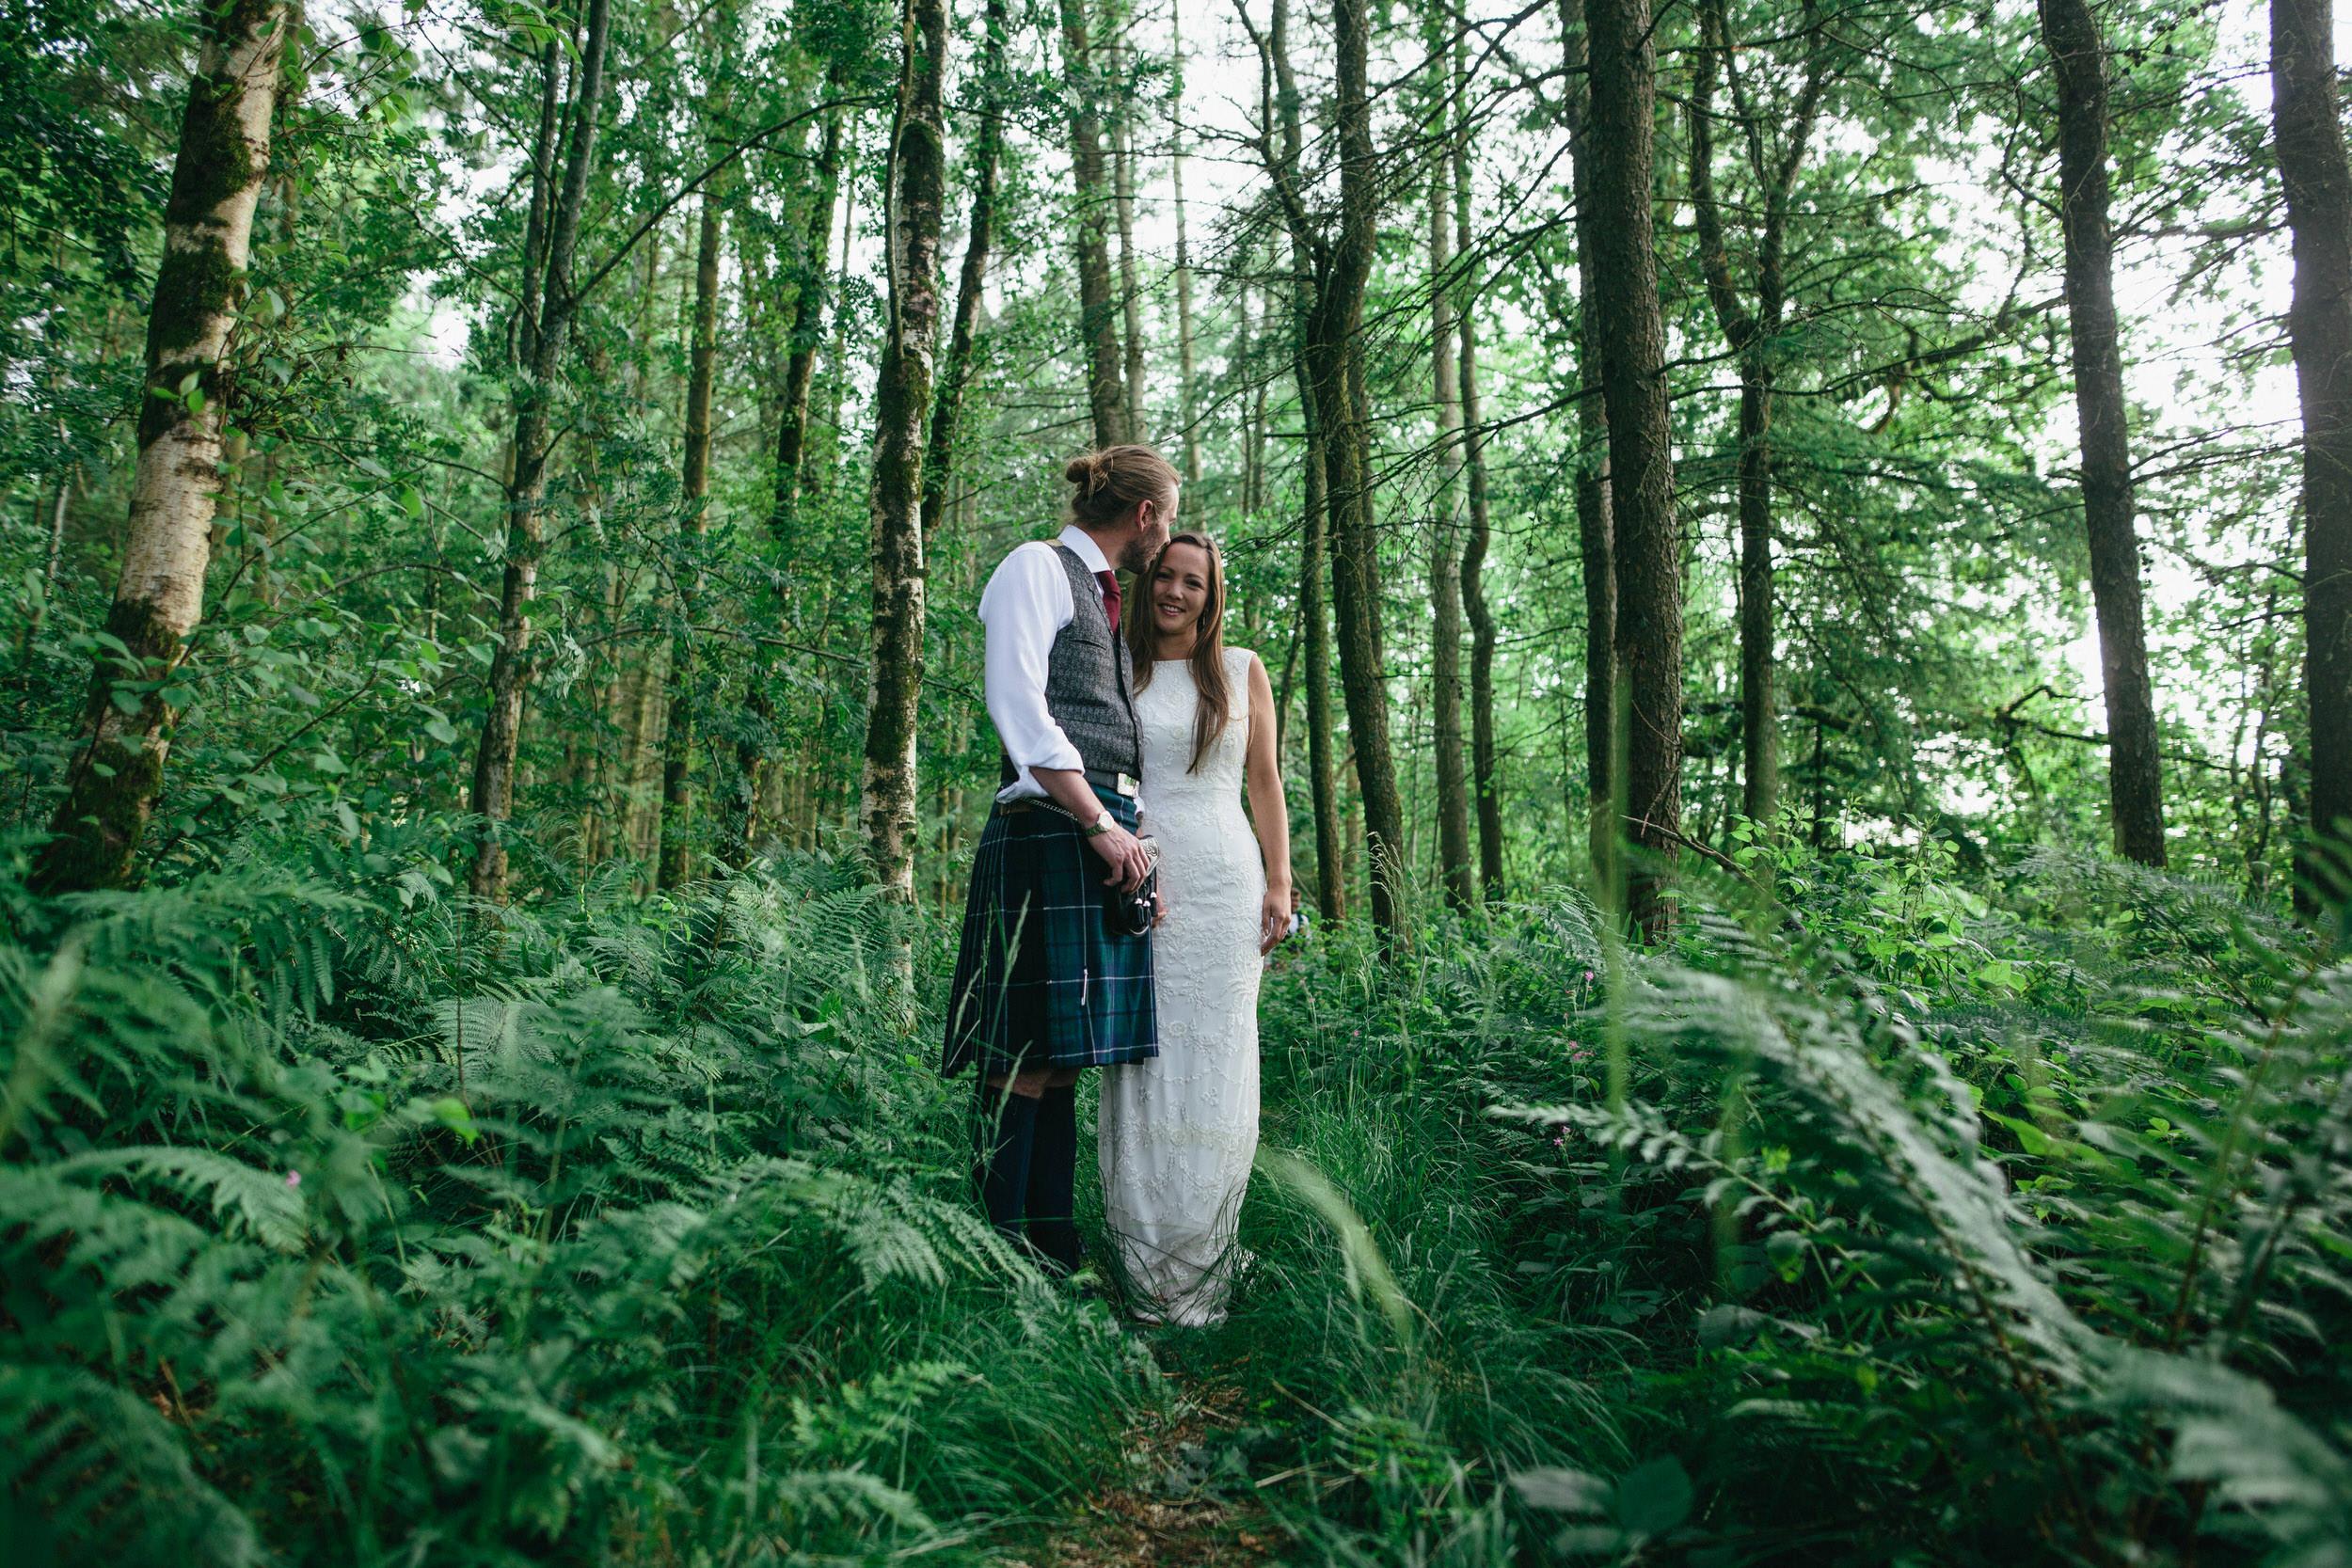 Quirky Wedding Photographer Scotland Glasgow Edinburgh Mirrorbox 125.jpg